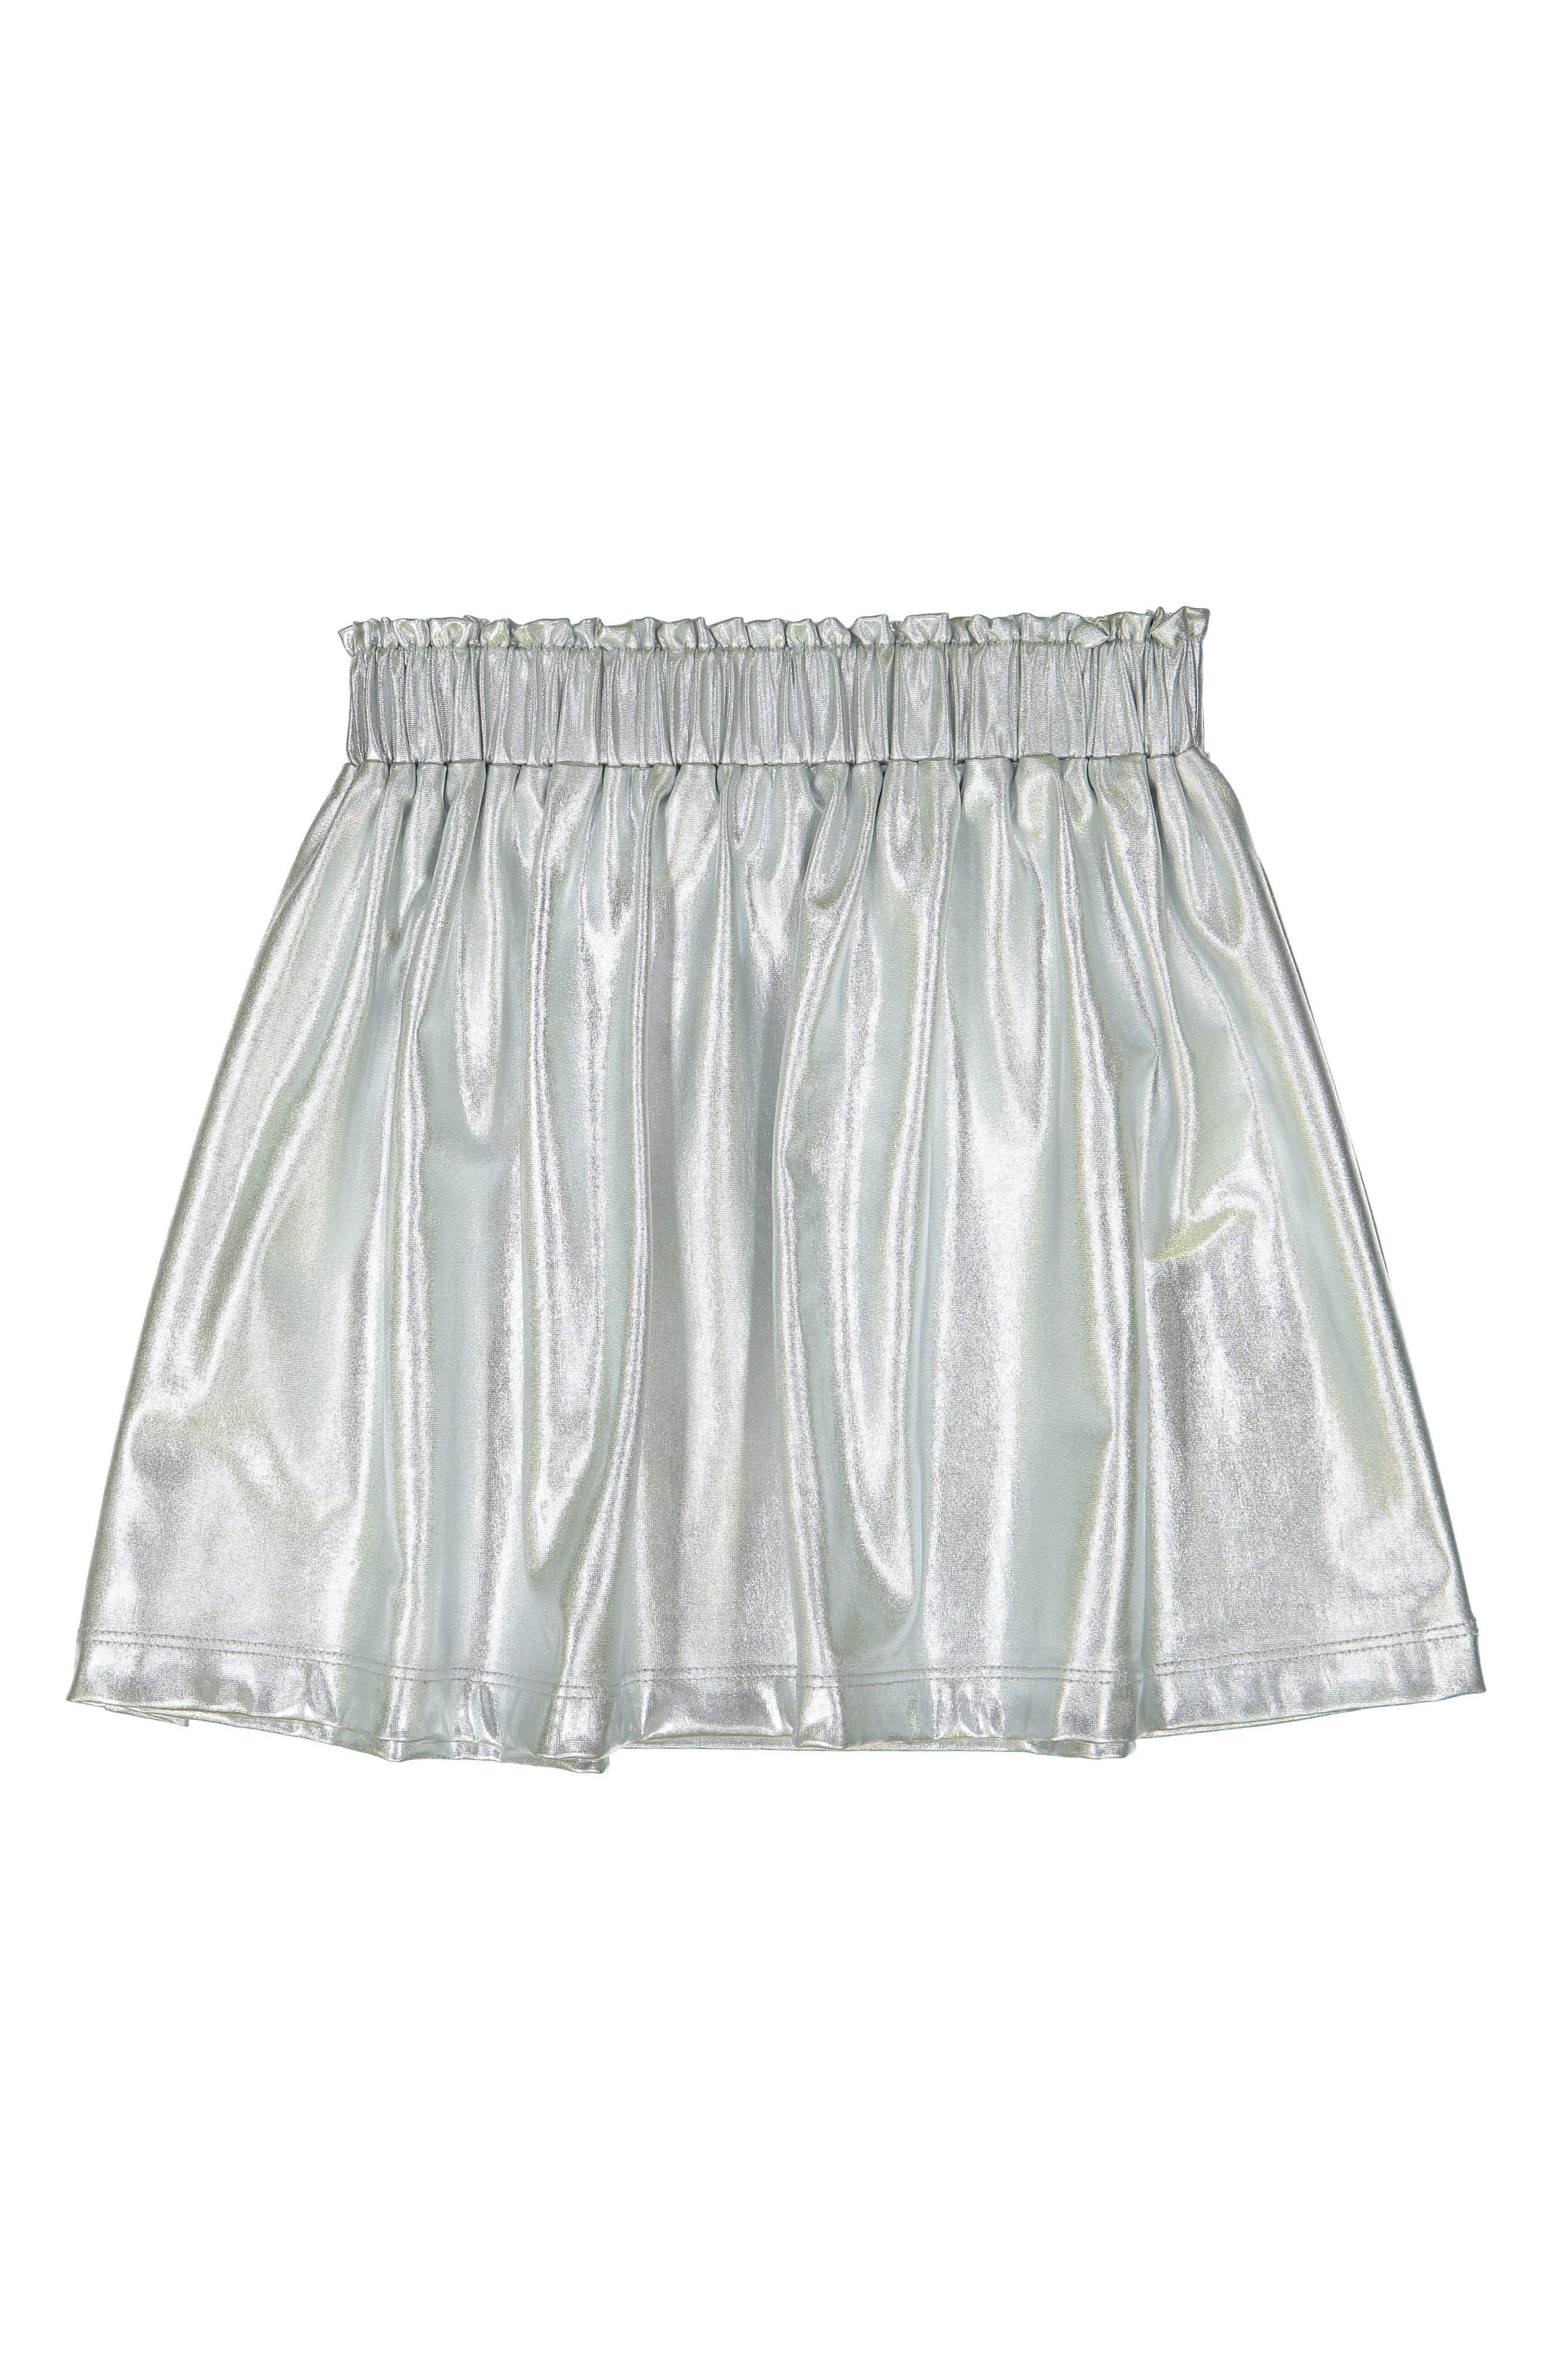 MASALA BABY, Silver Metallic Skirt, Main thumbnail 1, color, 040